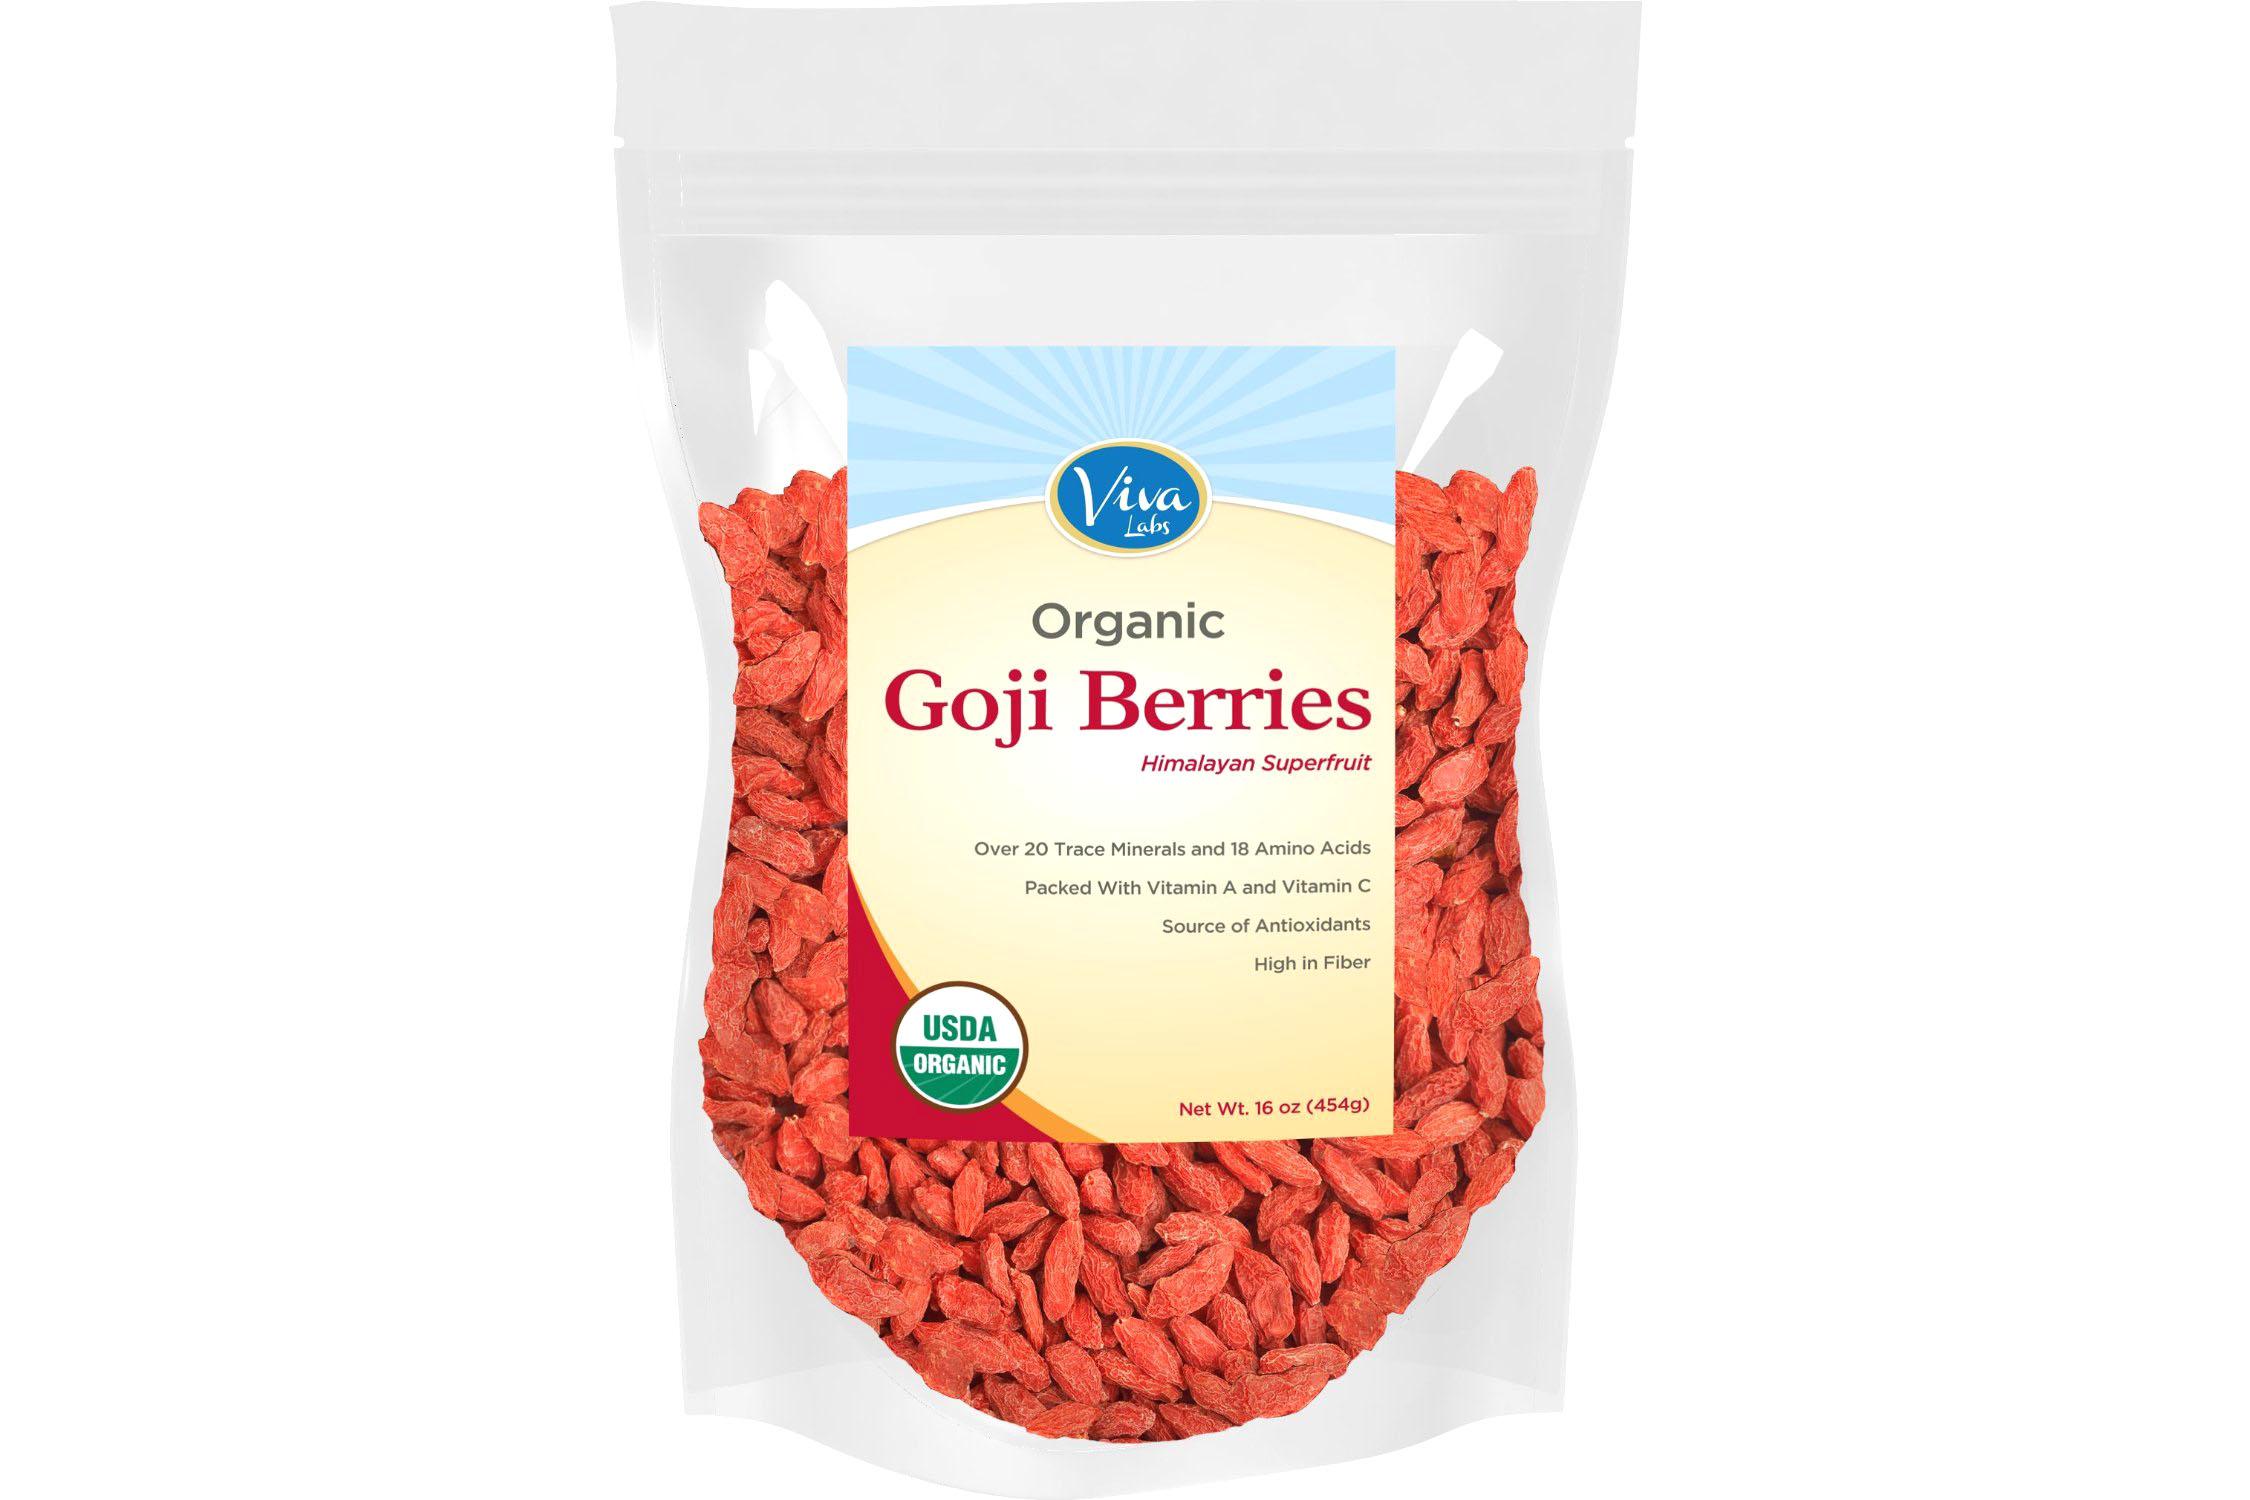 Premium Goji Berries, 1 lb - 4.5 stars - $17 (Prime)